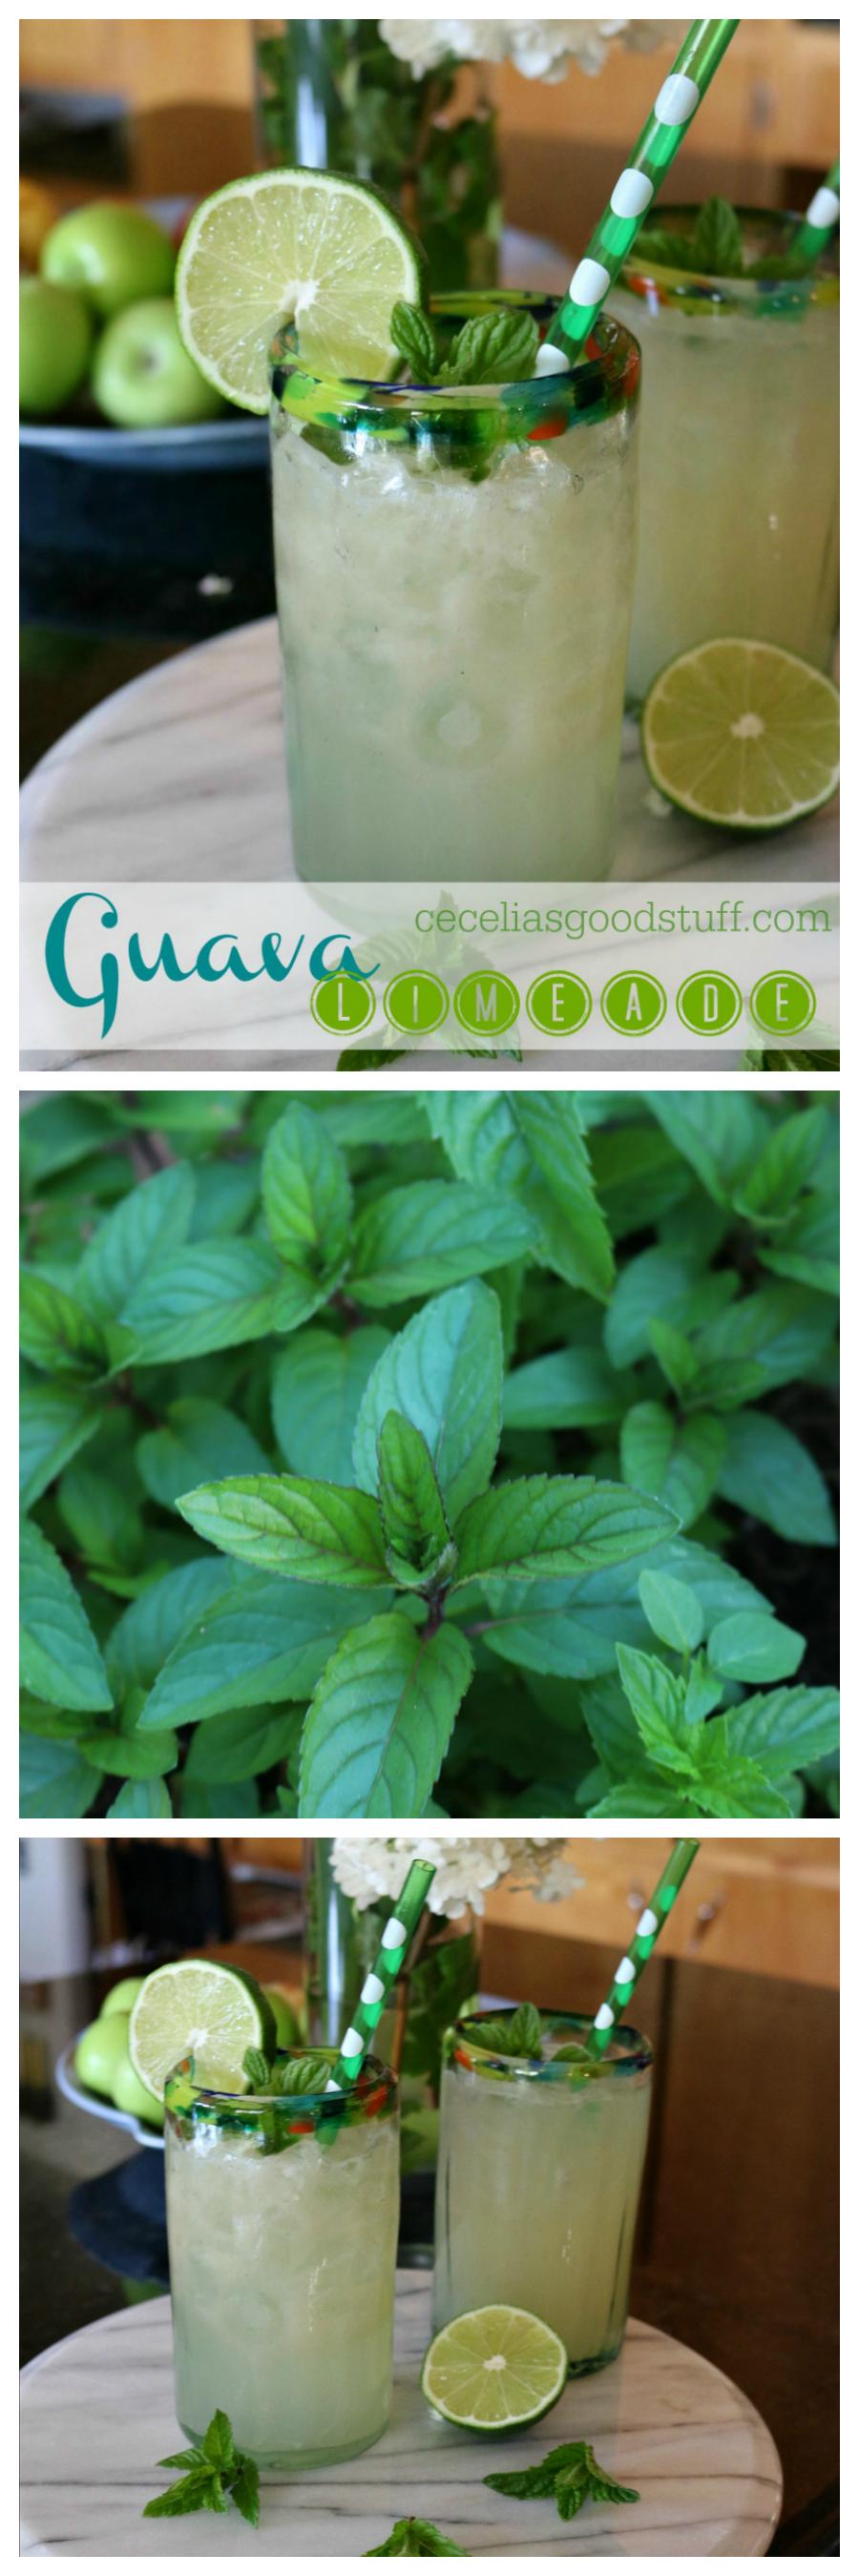 Guava Limeade CeceliasGoodStuff.com Good Food for Good People